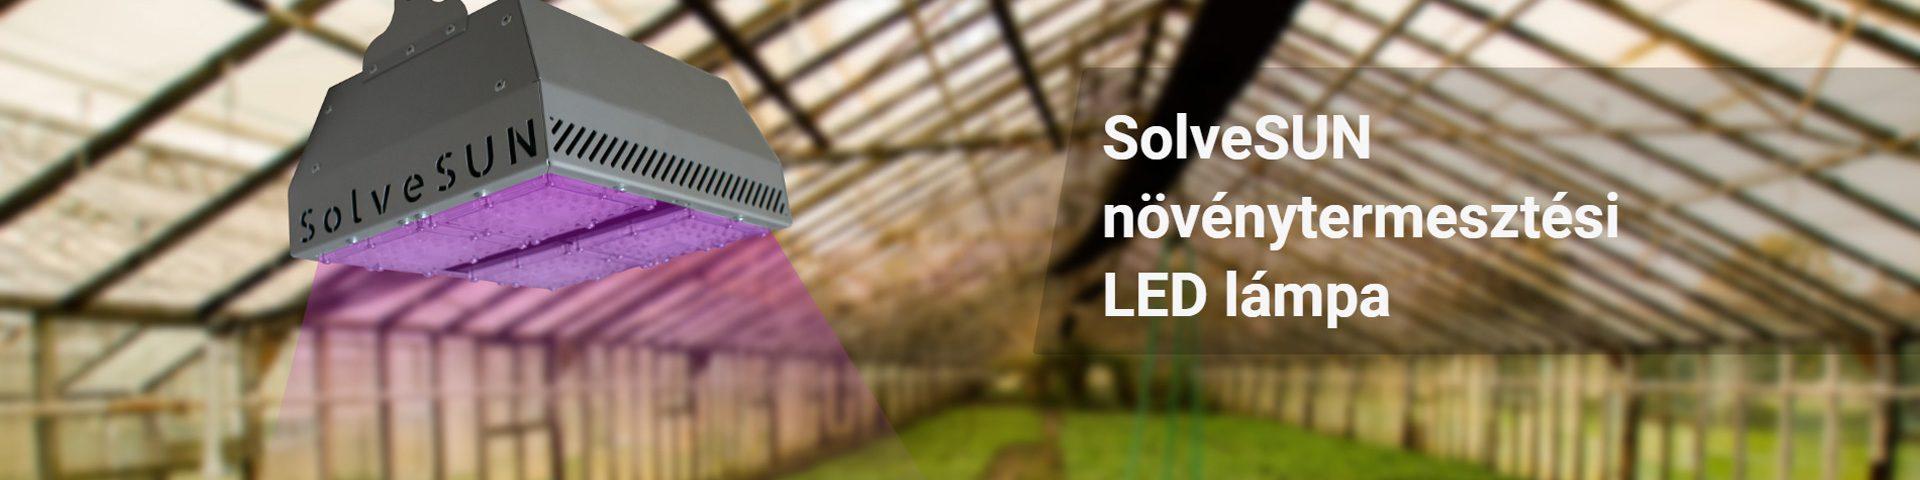 solvelectric_solvesun_novenytermesztesi_led_lampa